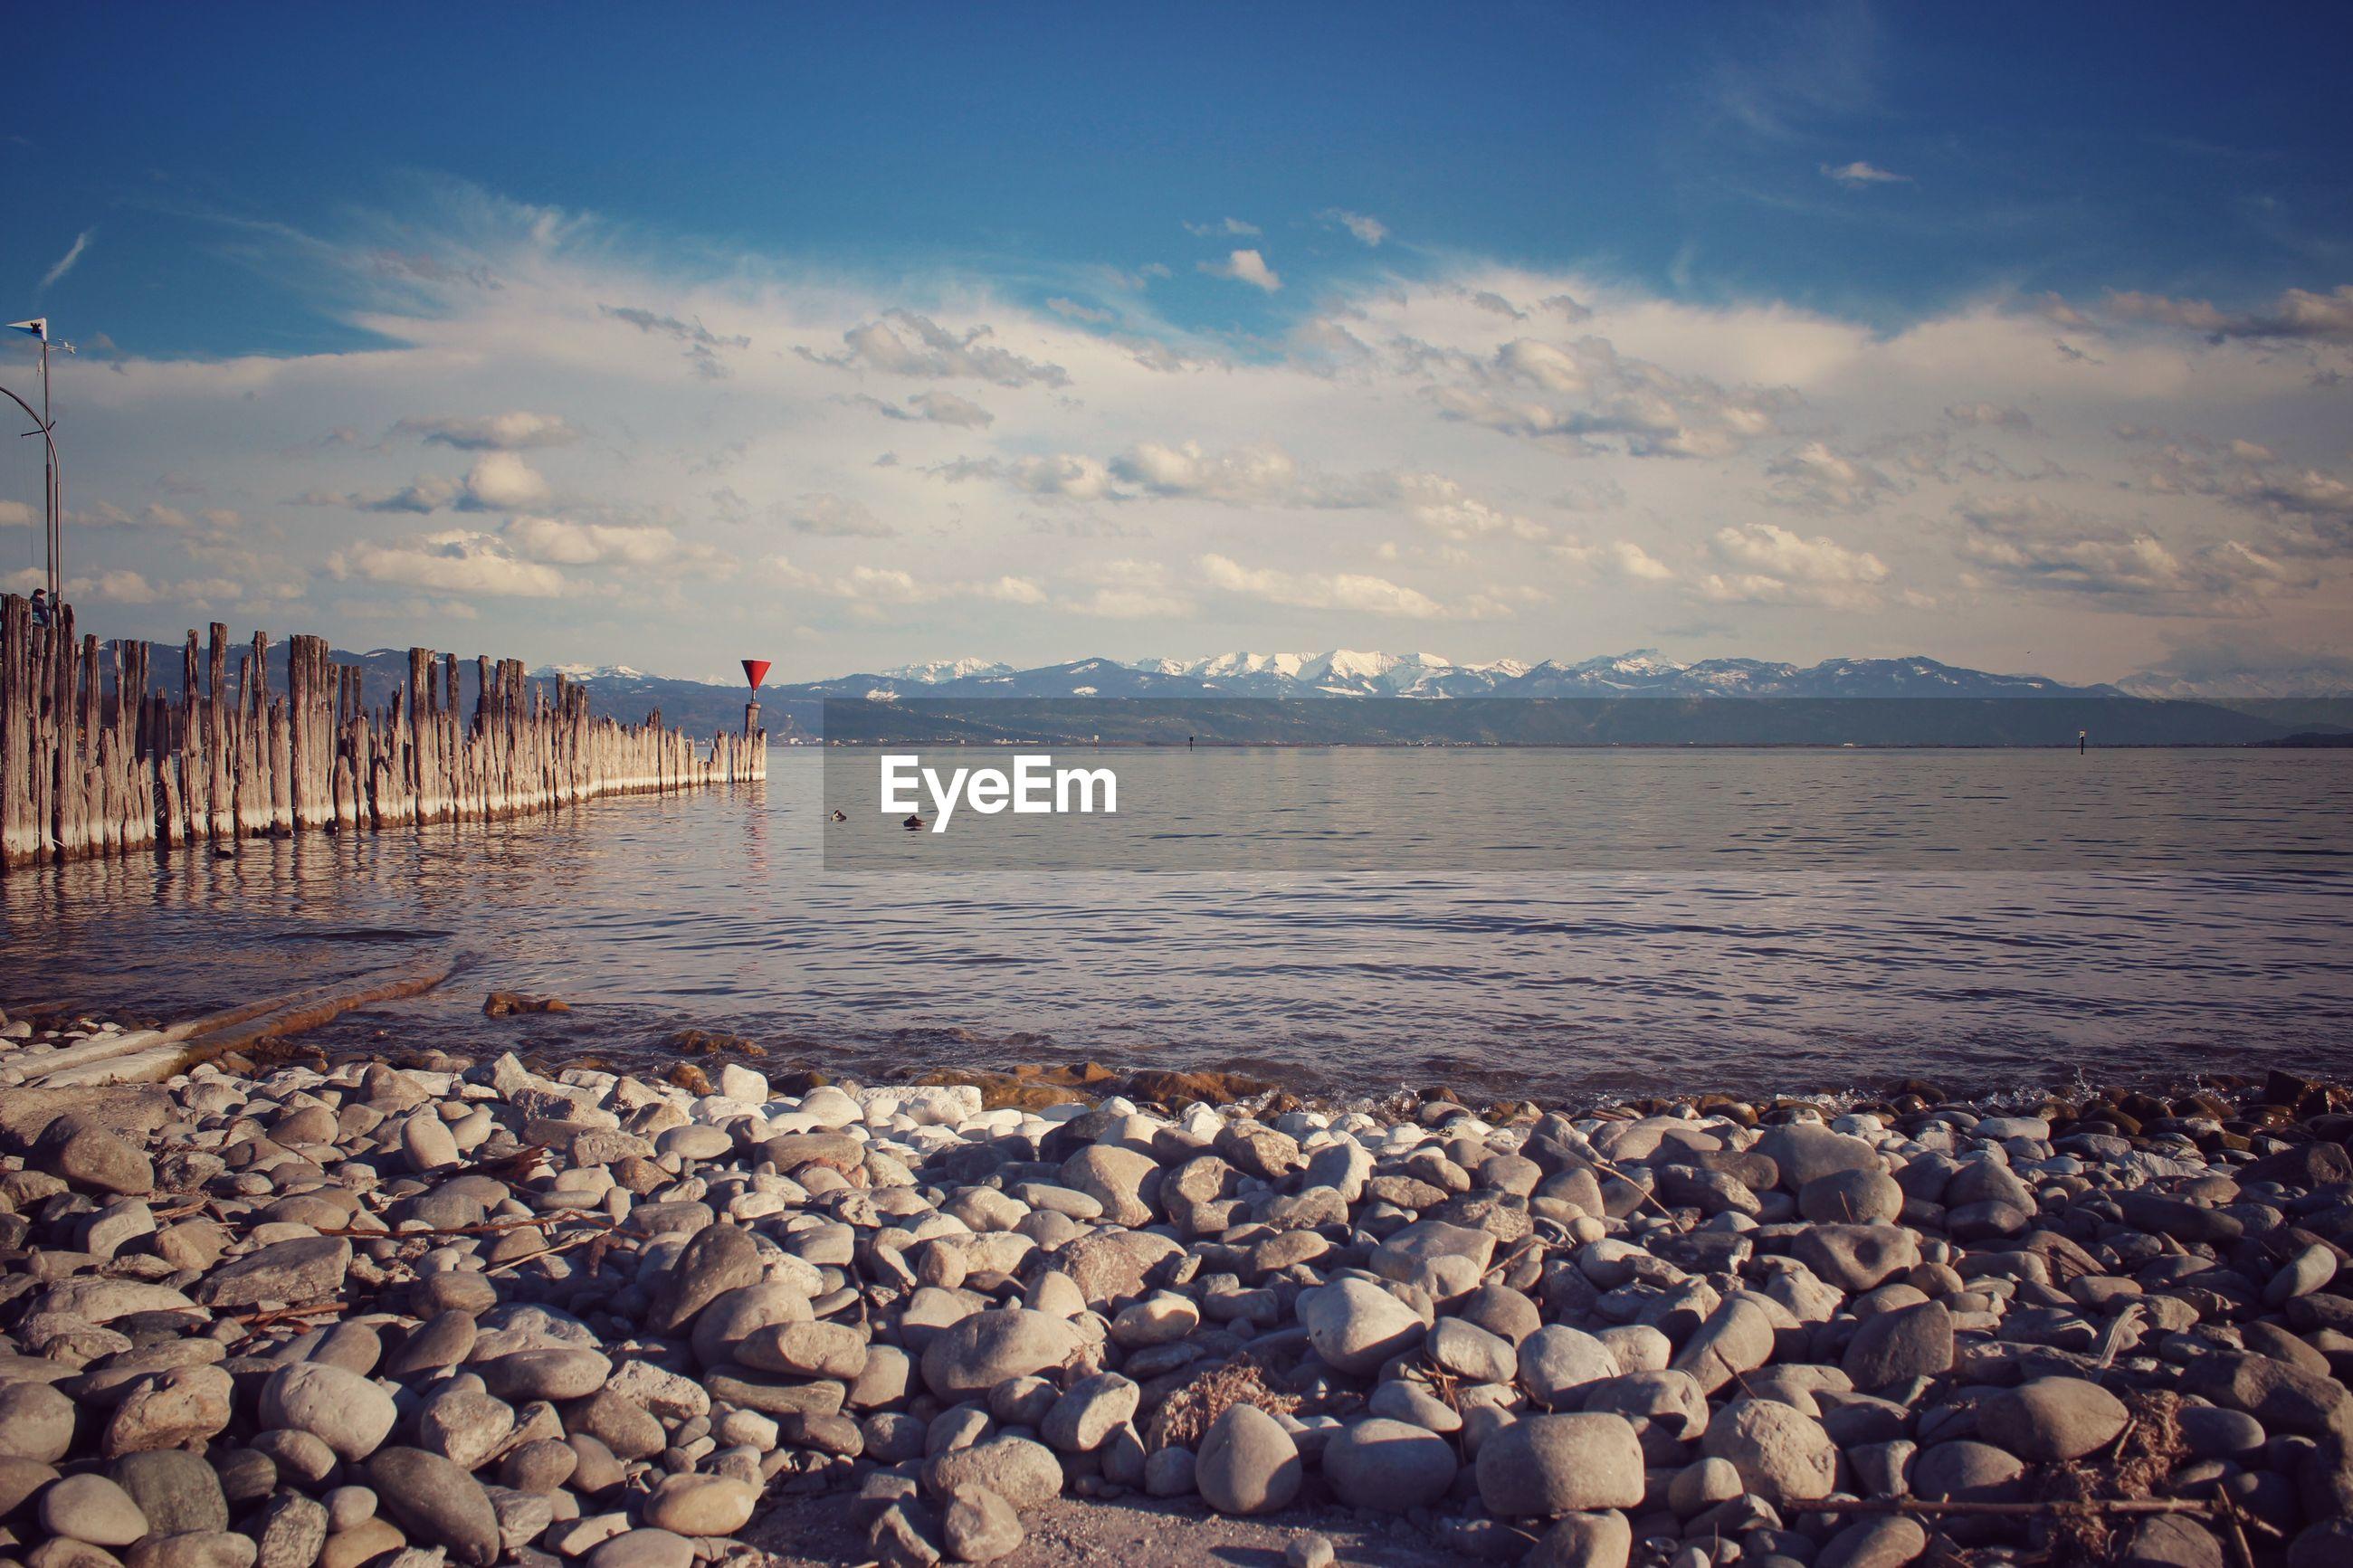 VIEW OF PEBBLE BEACH